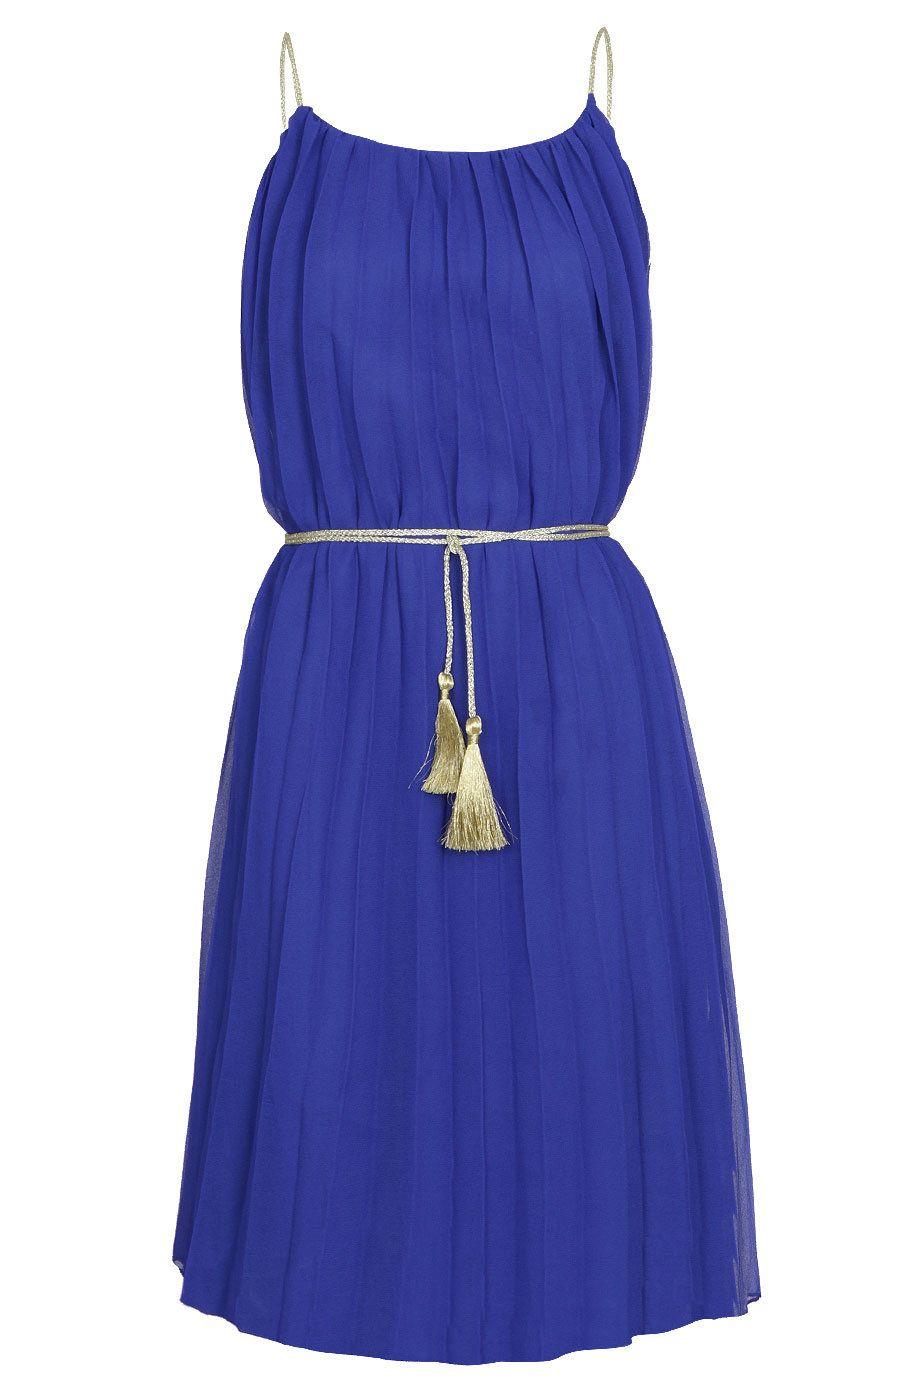 Vestido azul plisado | vestidos damas honor | Pinterest | Blue style ...